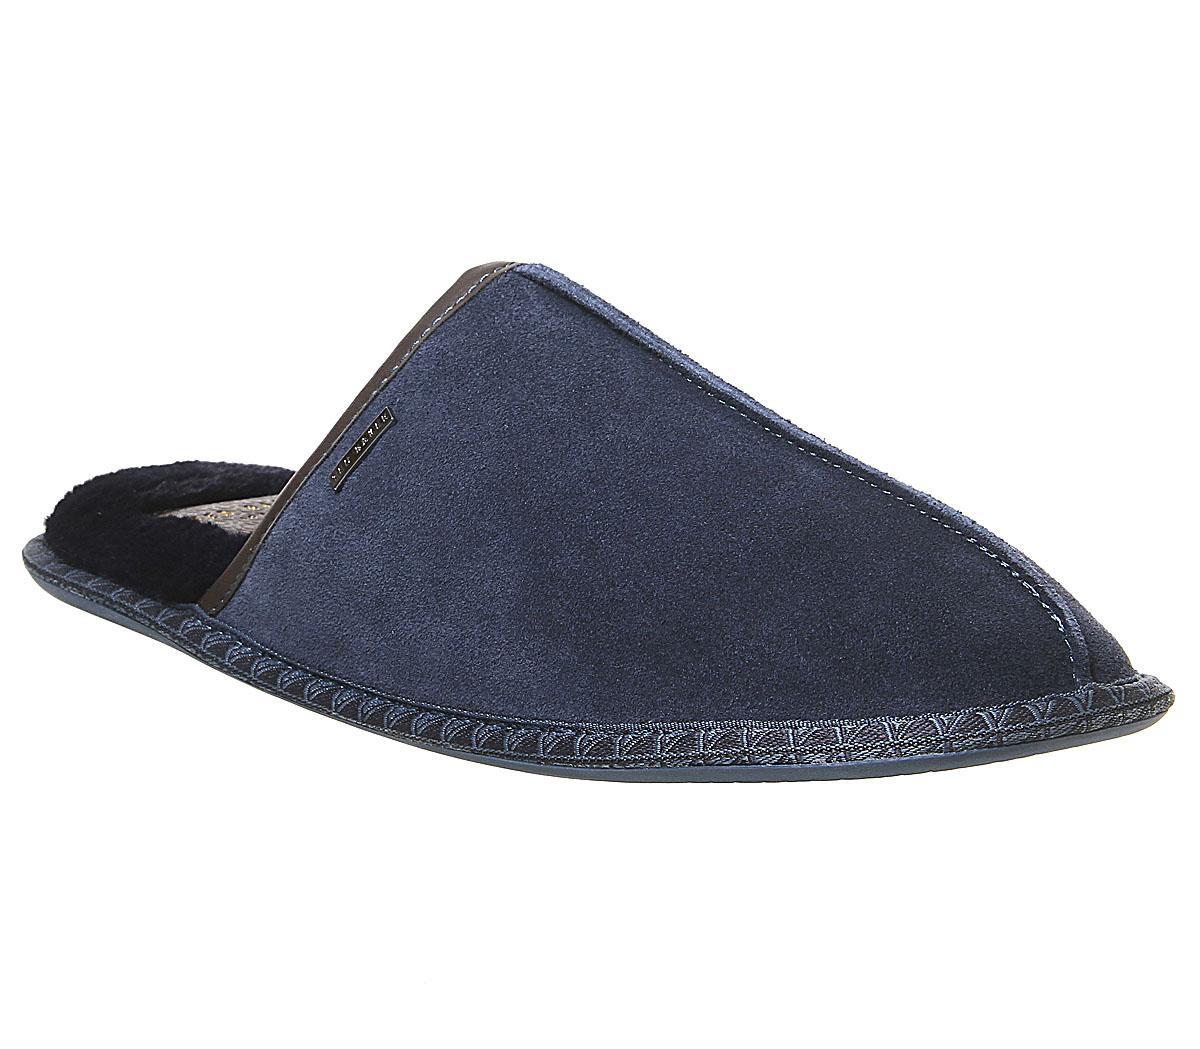 Parick Slippers